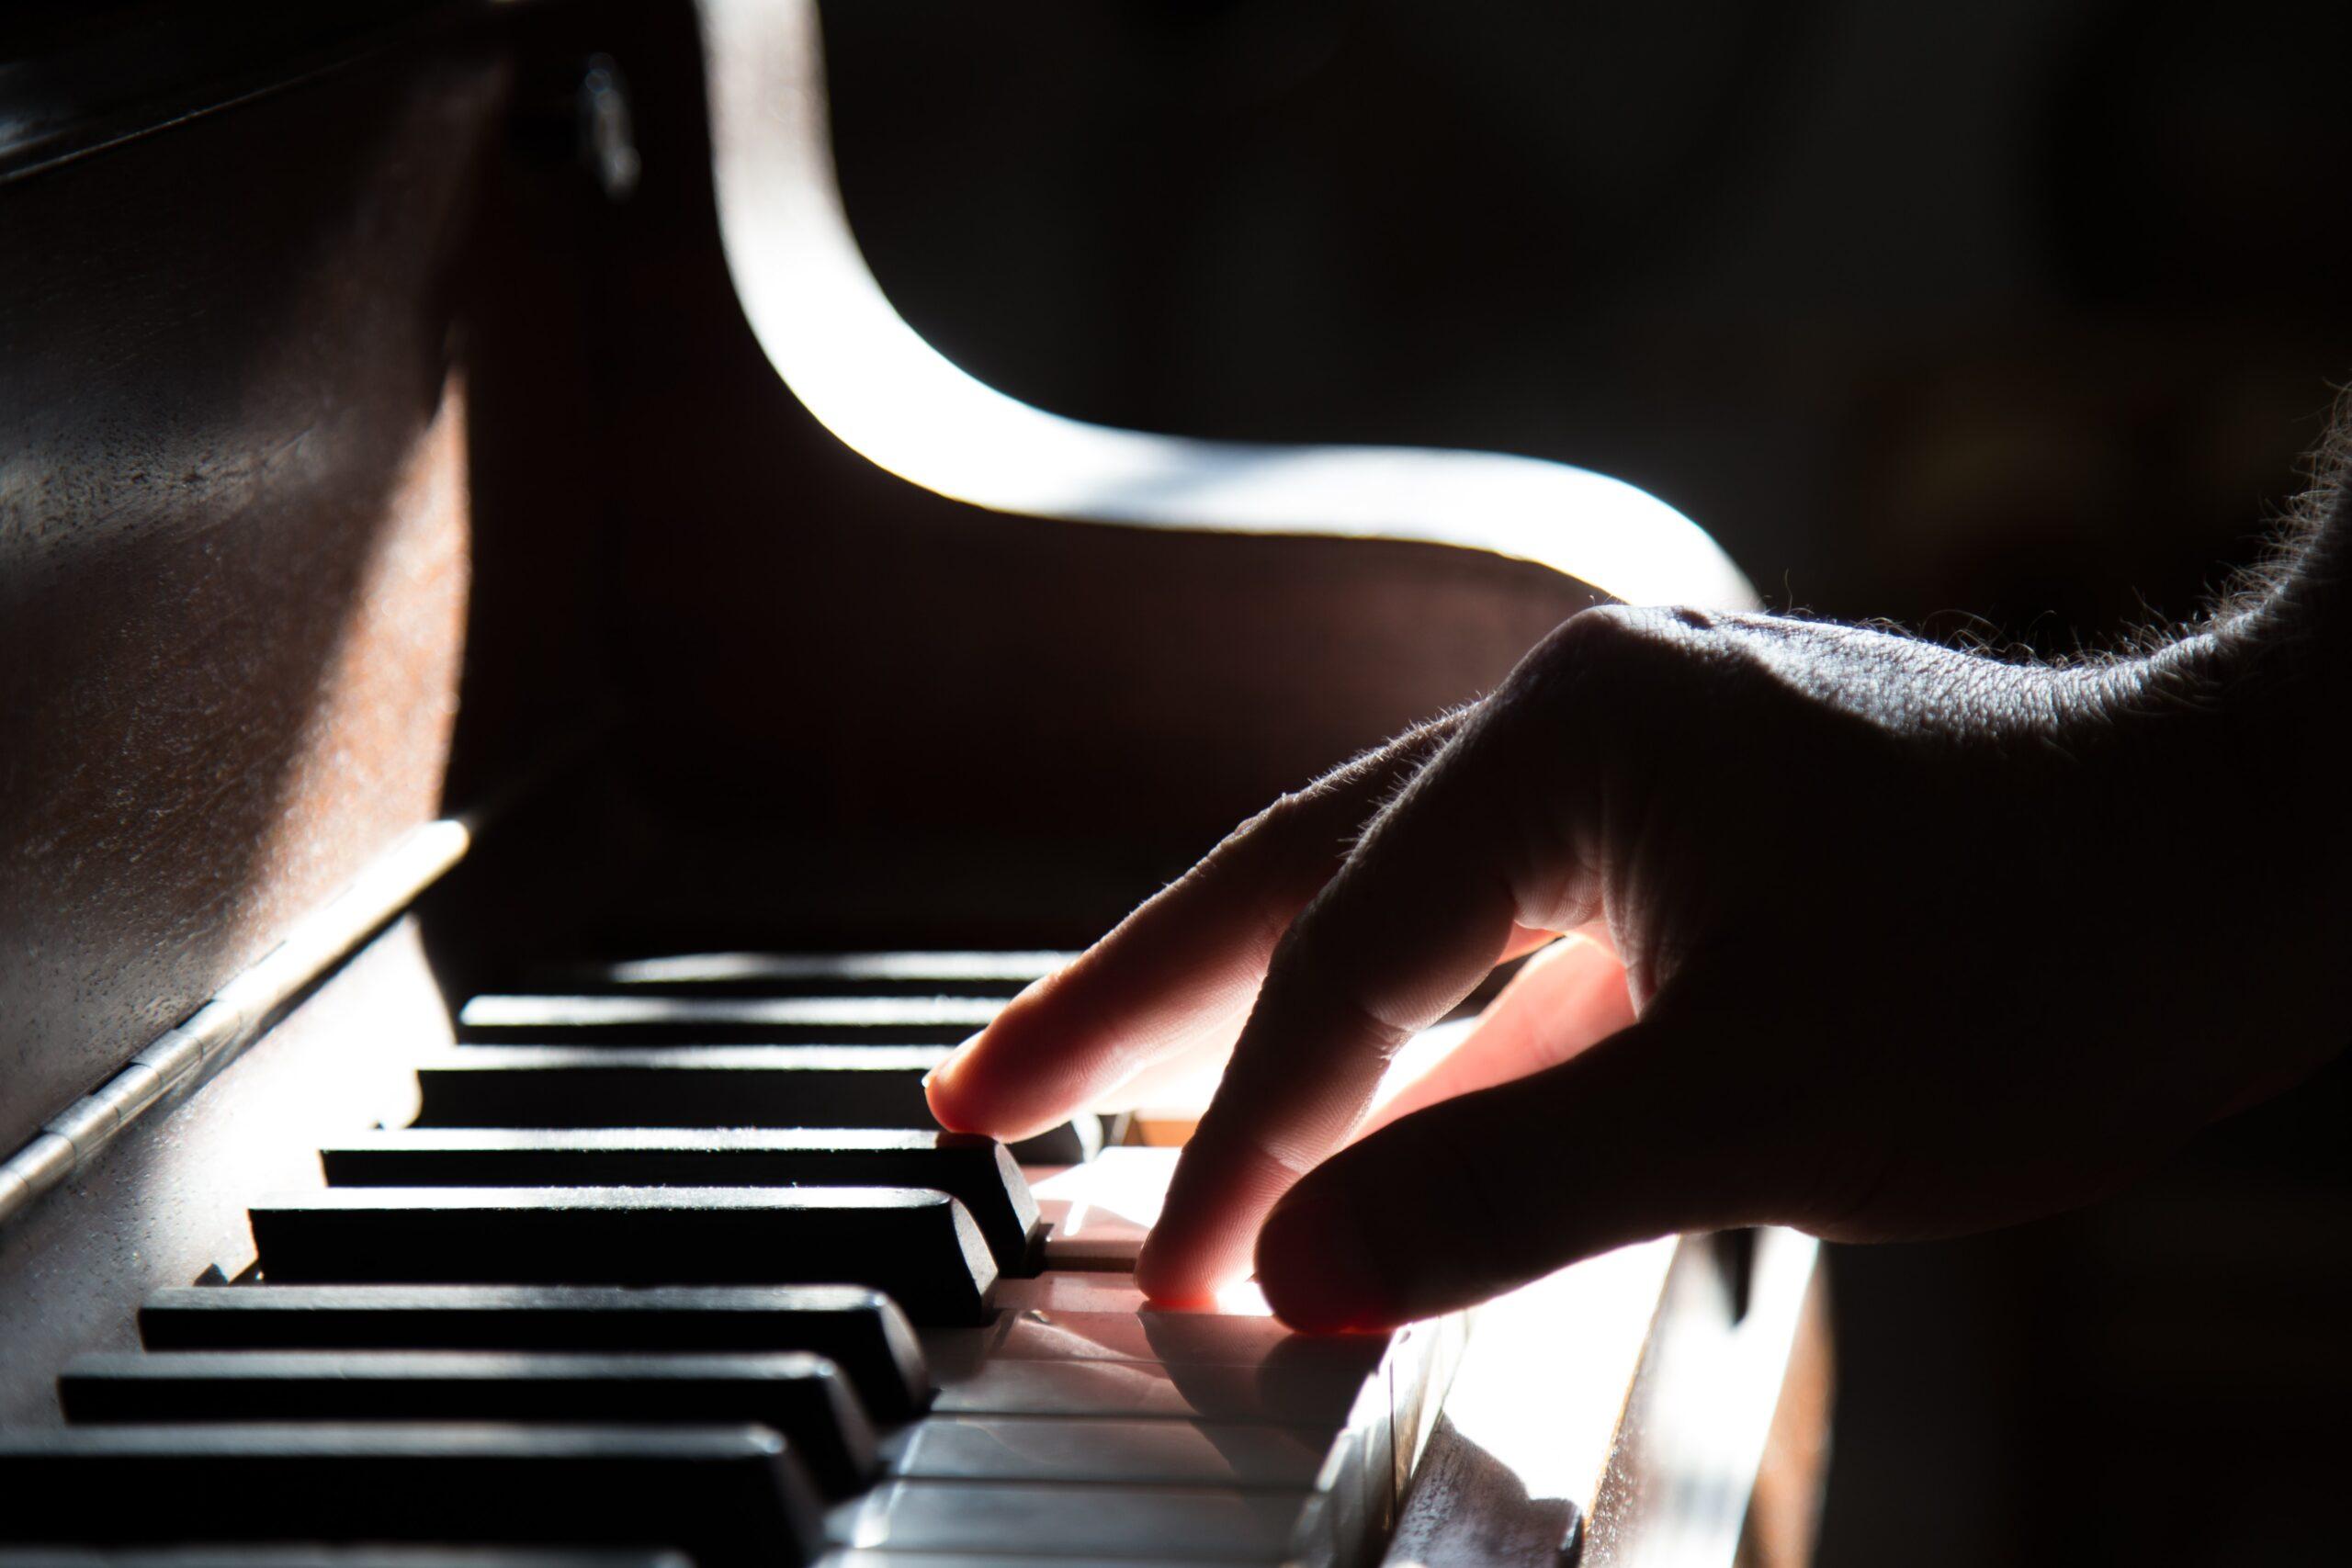 tadas-mikuckis-Close up of Right hand on piano keys-unsplash